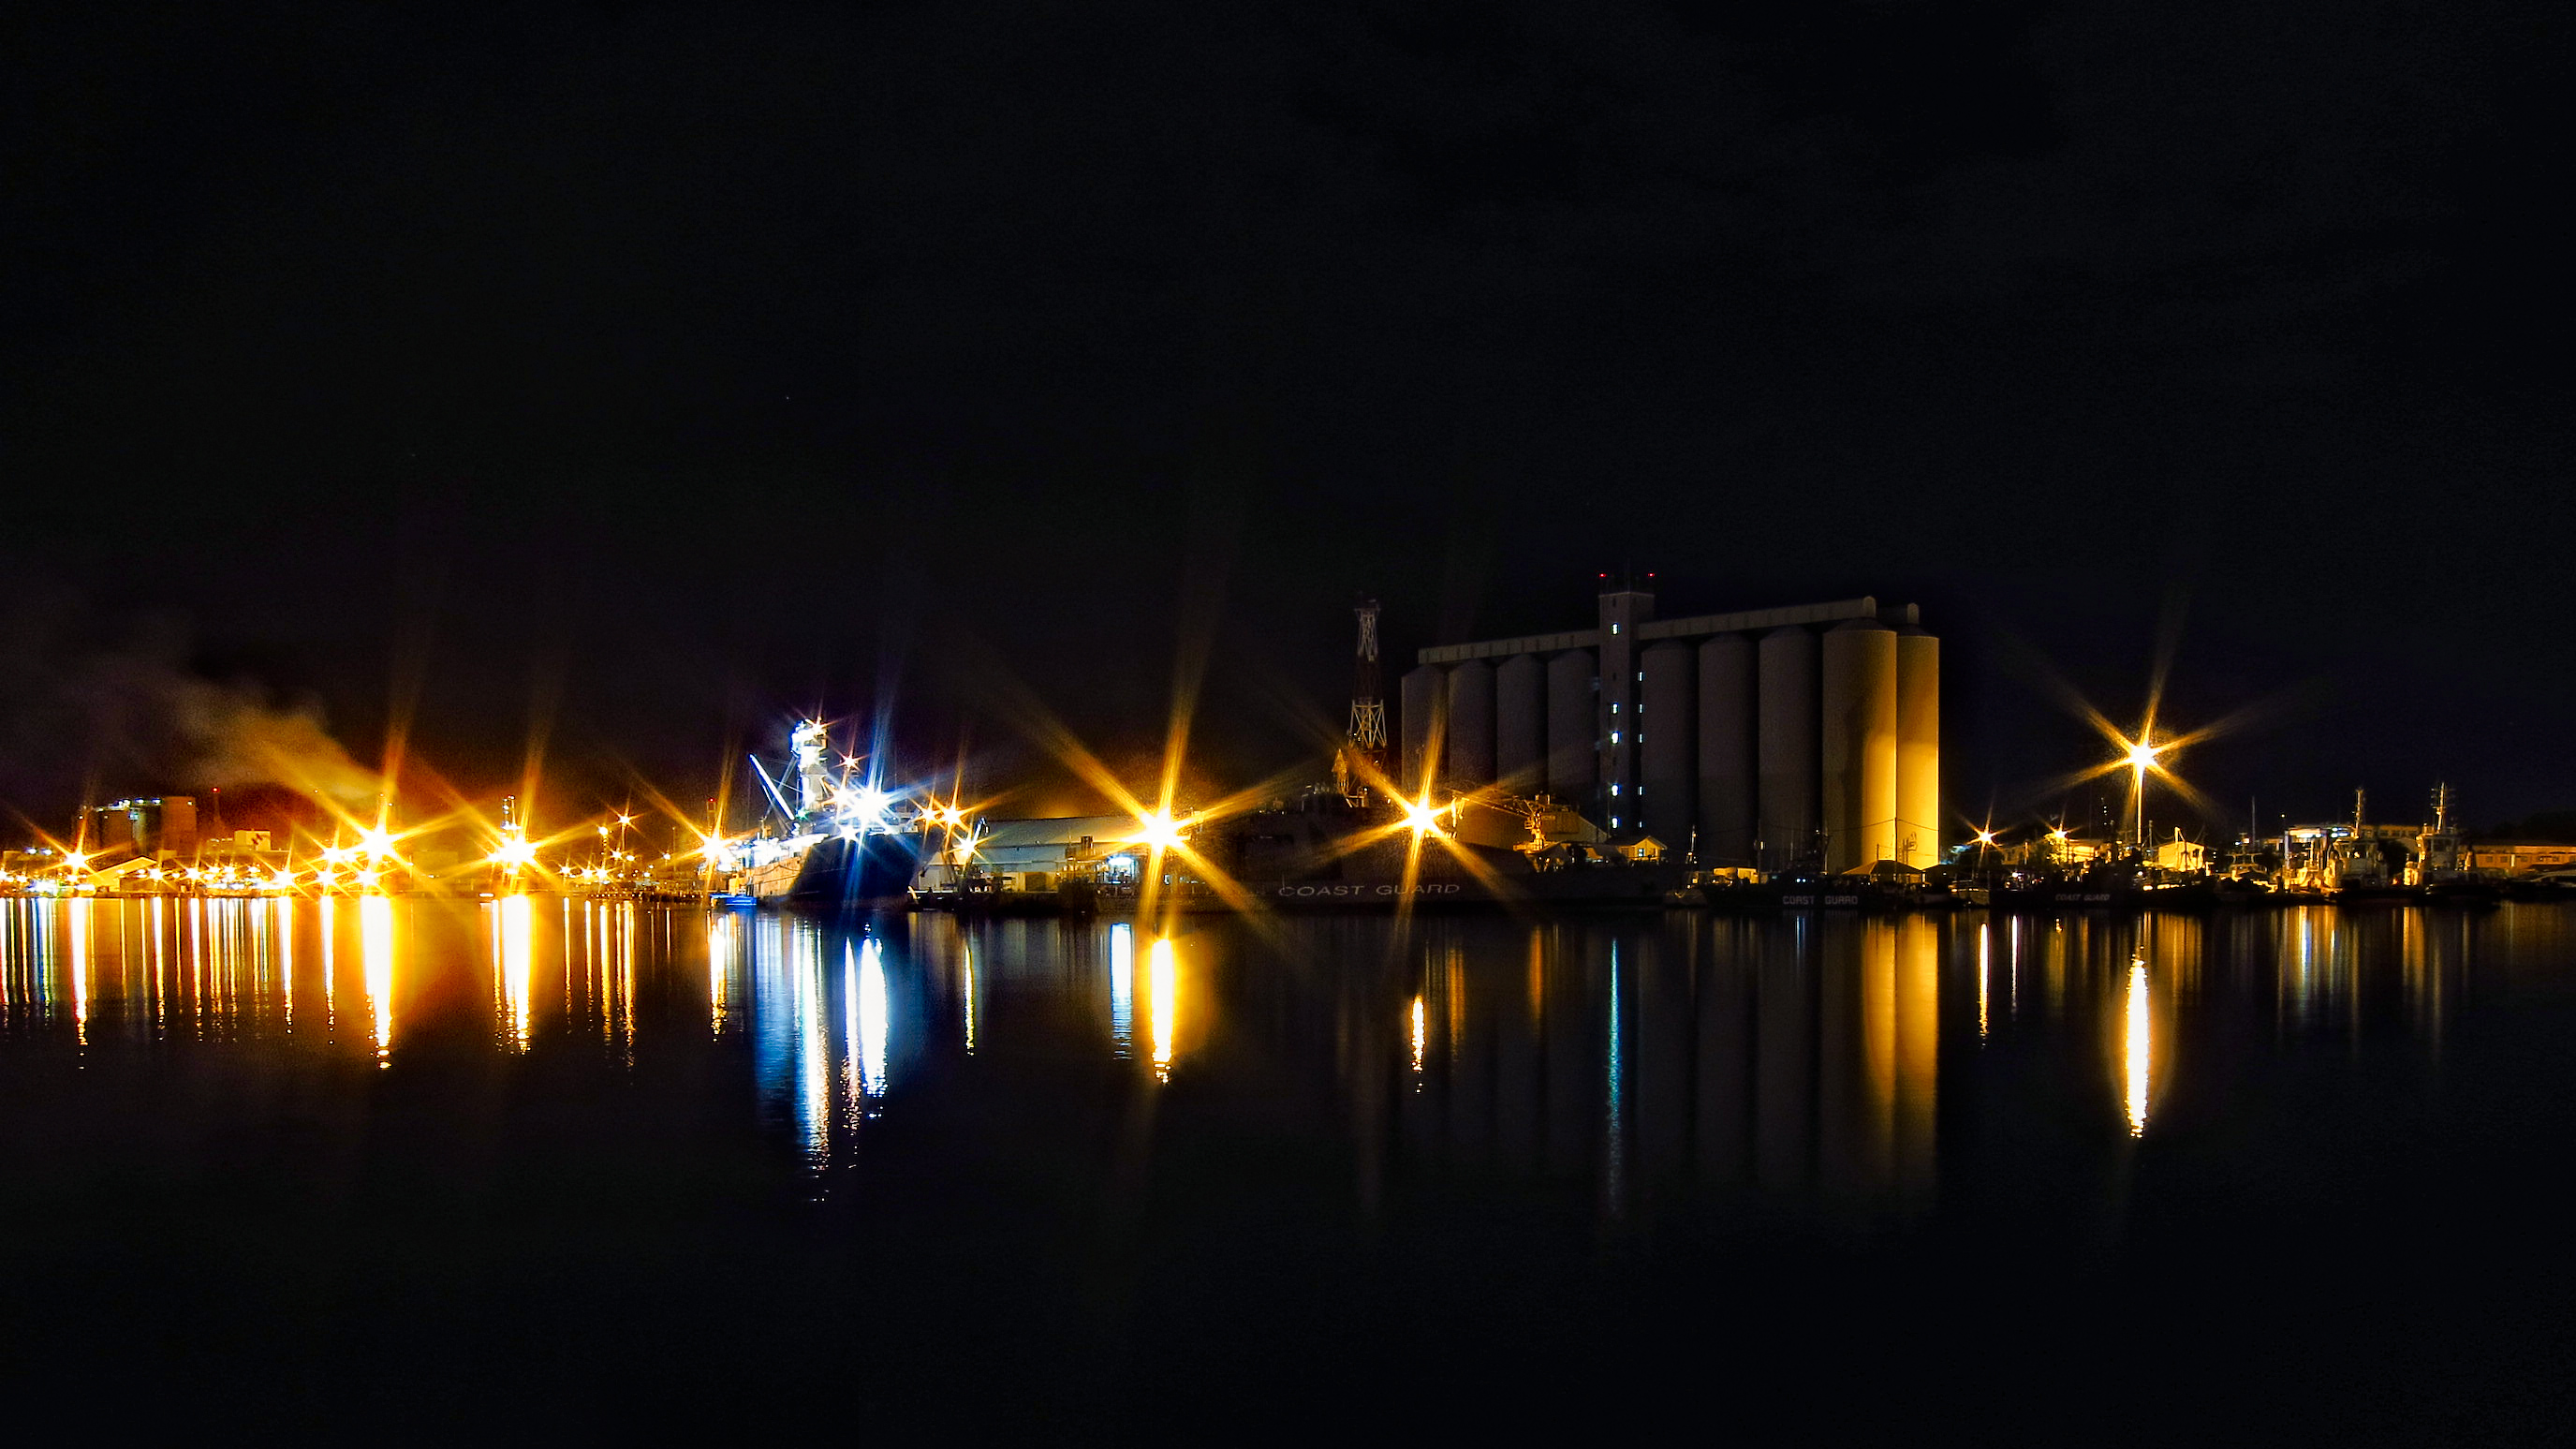 Port Louis at night (Photo kohsah on Flickr)